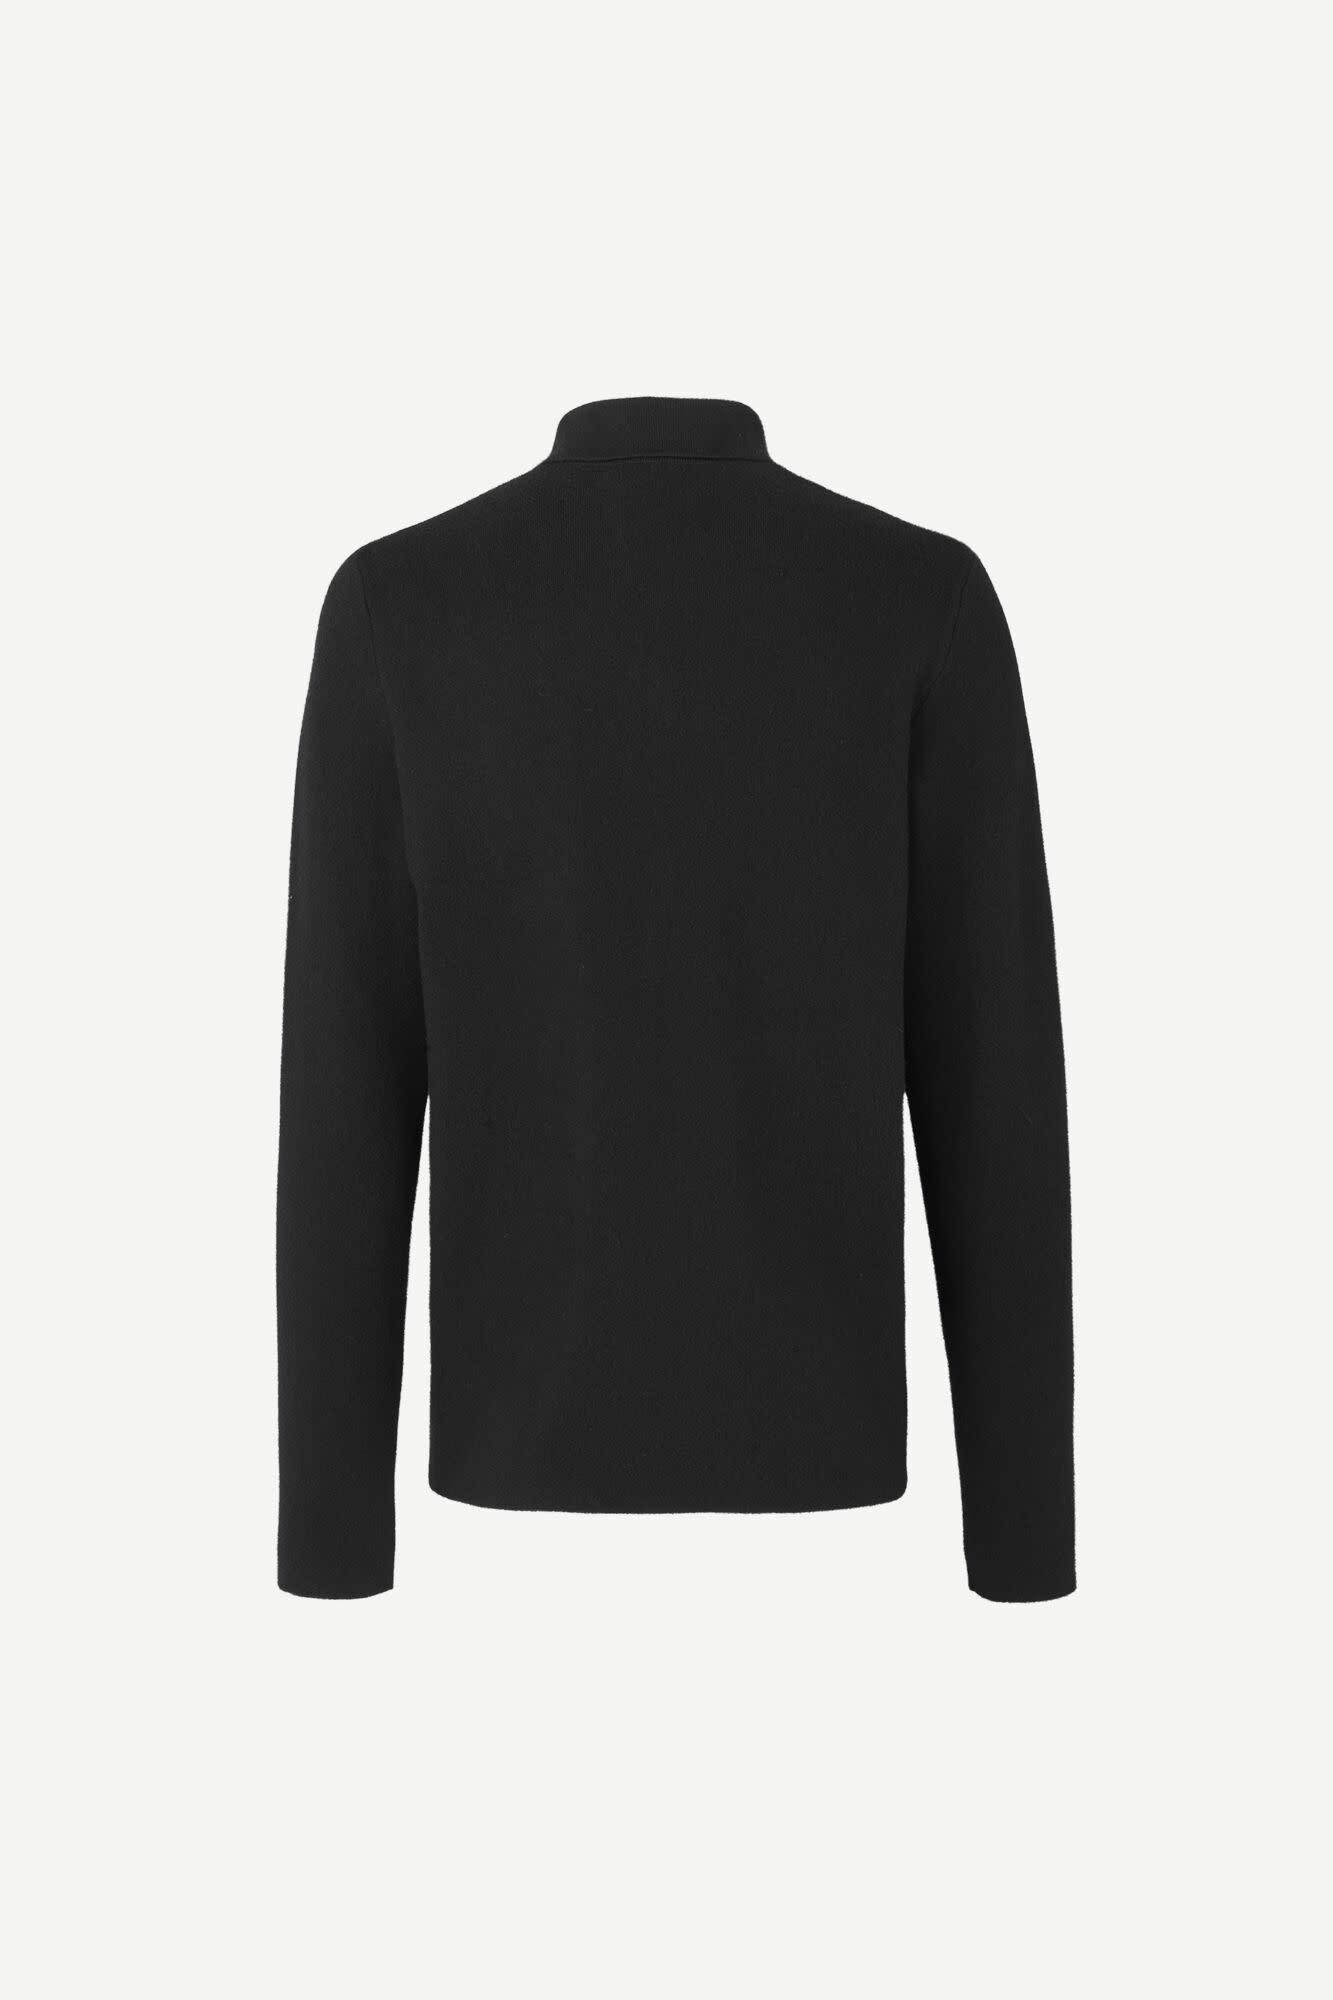 Guna X Zip Knitwear Vest Black 10490-2